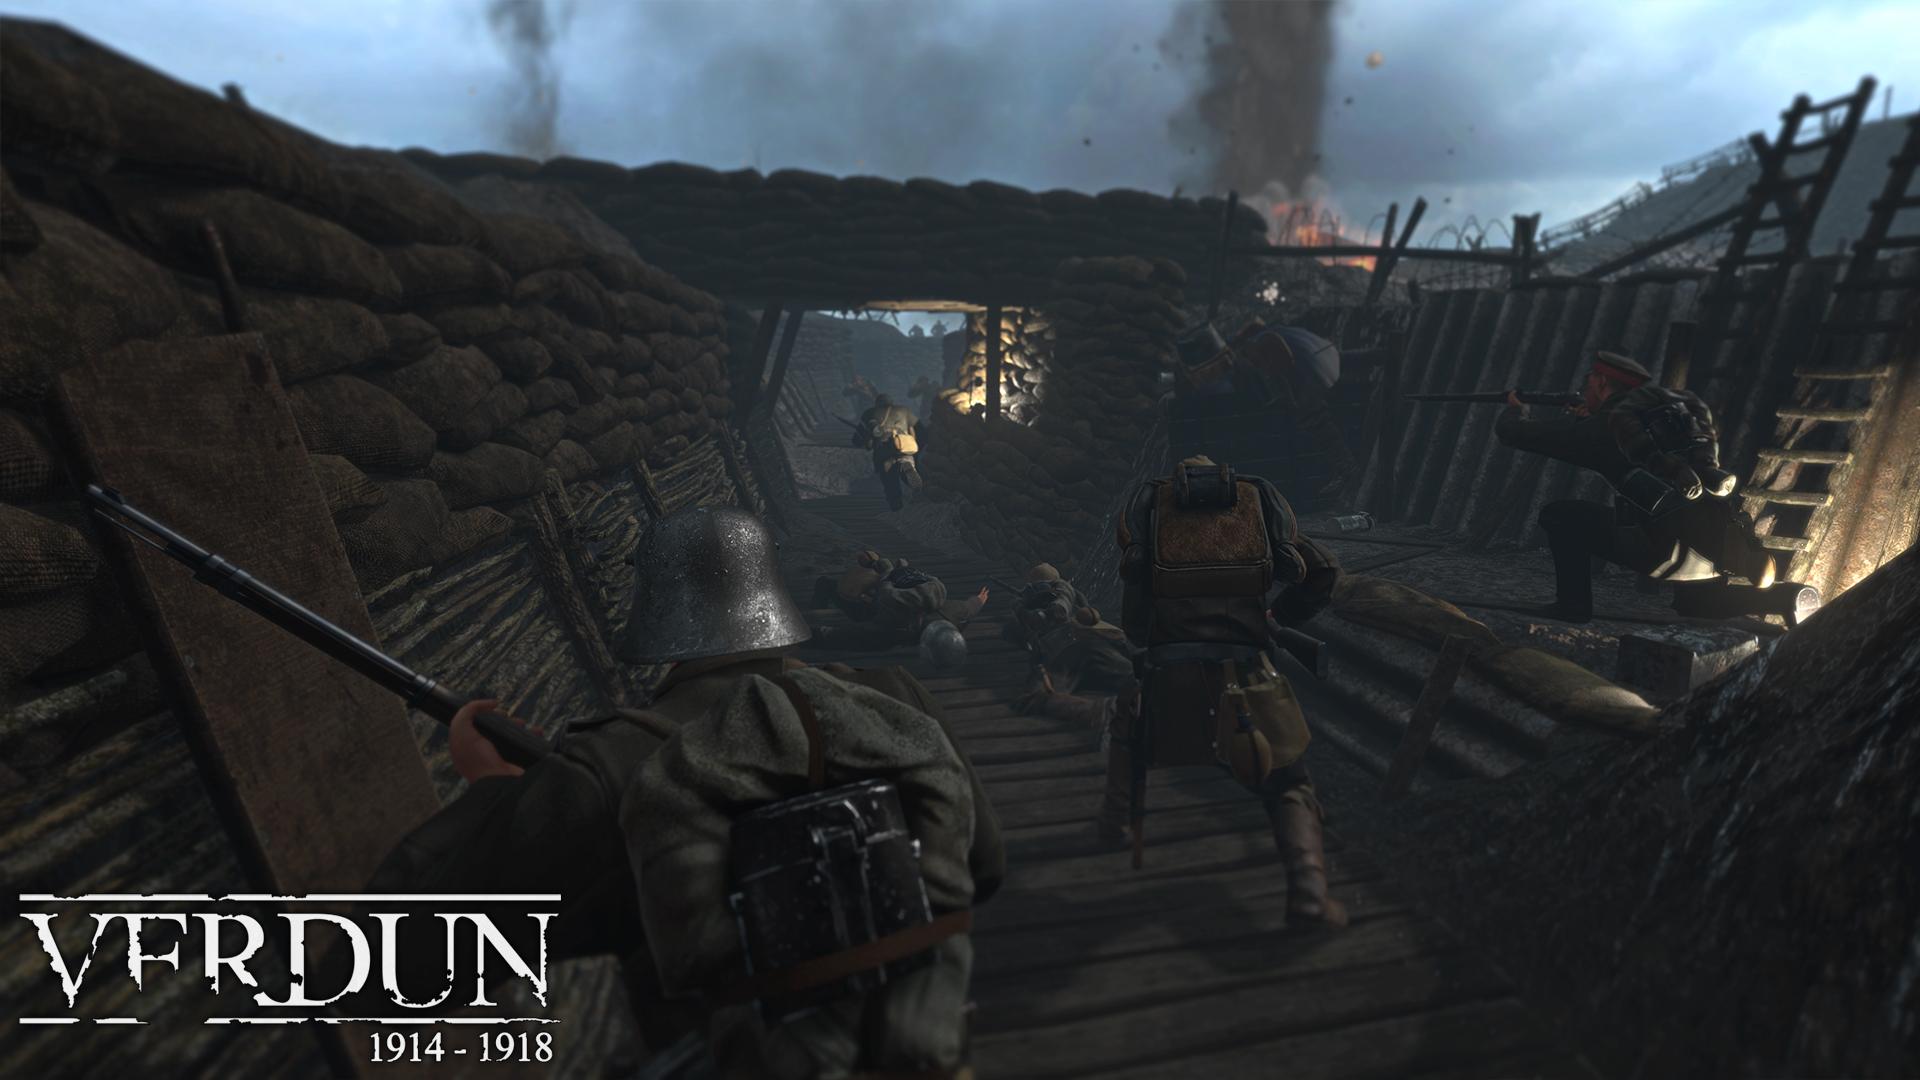 verdun_world_war_one_multiplayer_fps_released_for_linux_mac_windows_pc